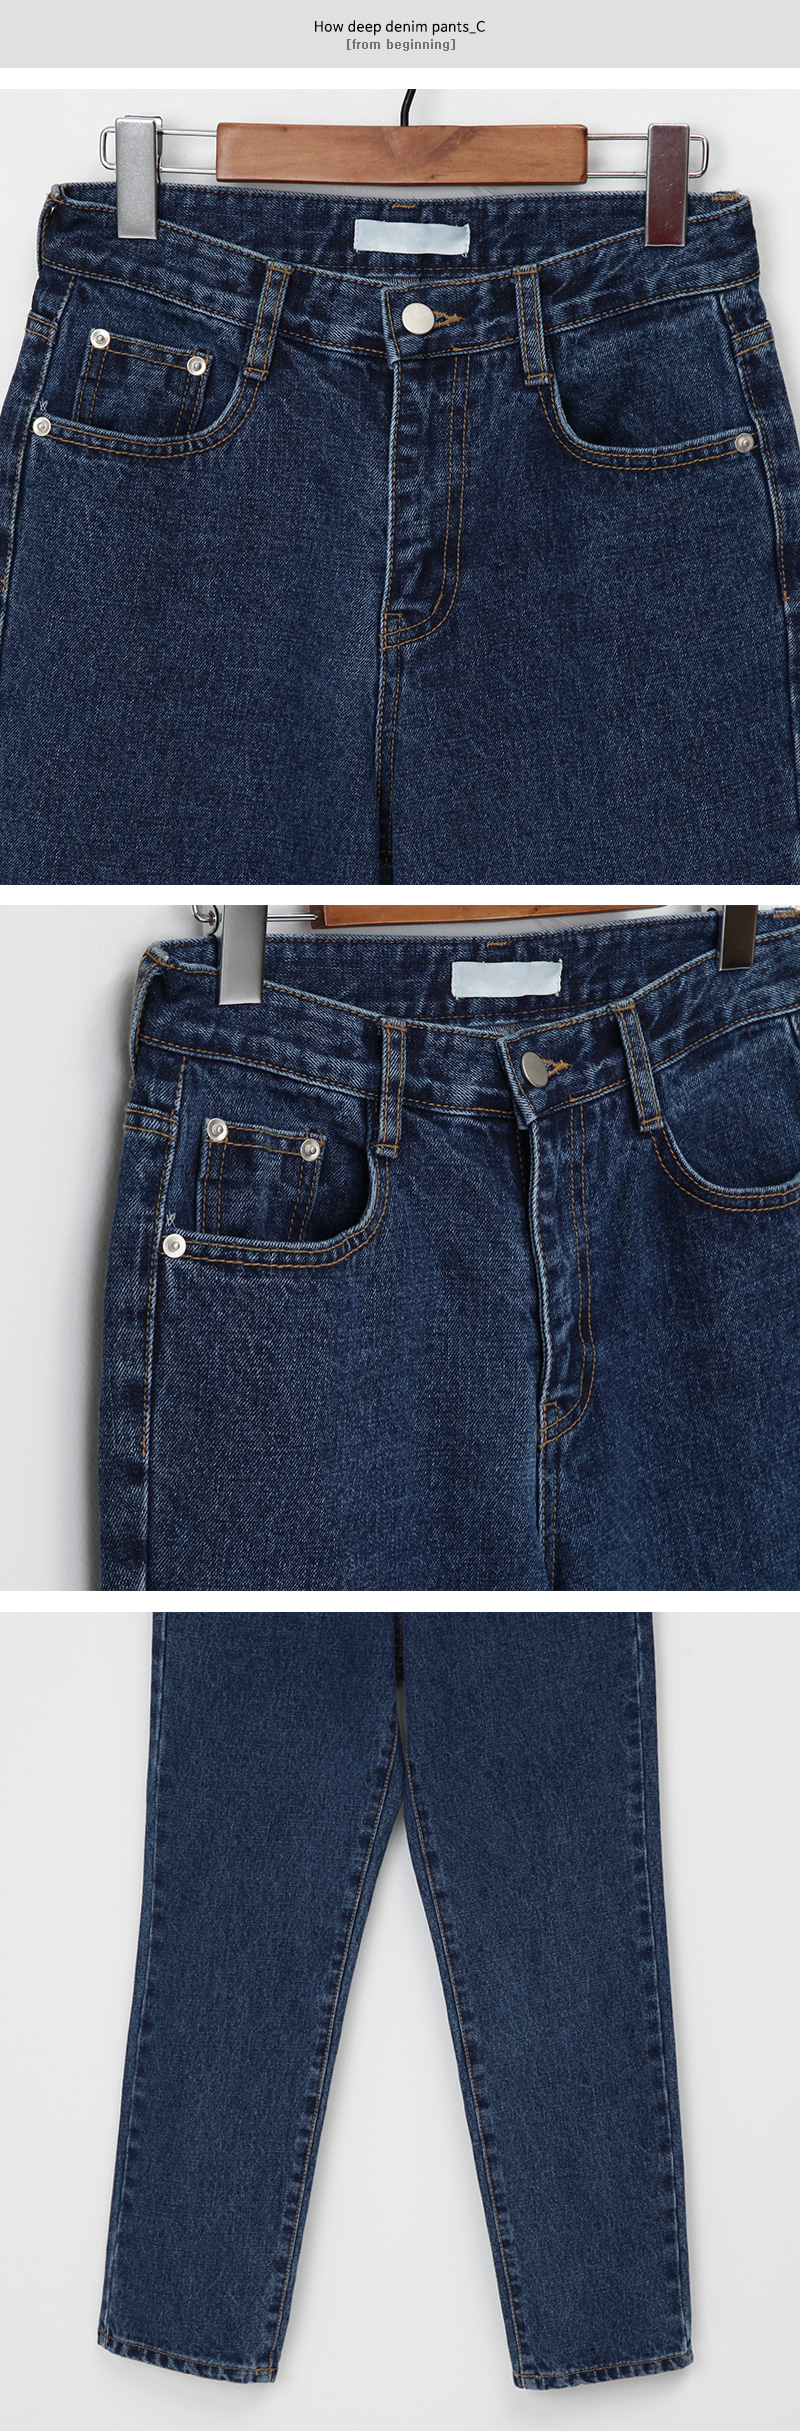 How deep denim pants_C